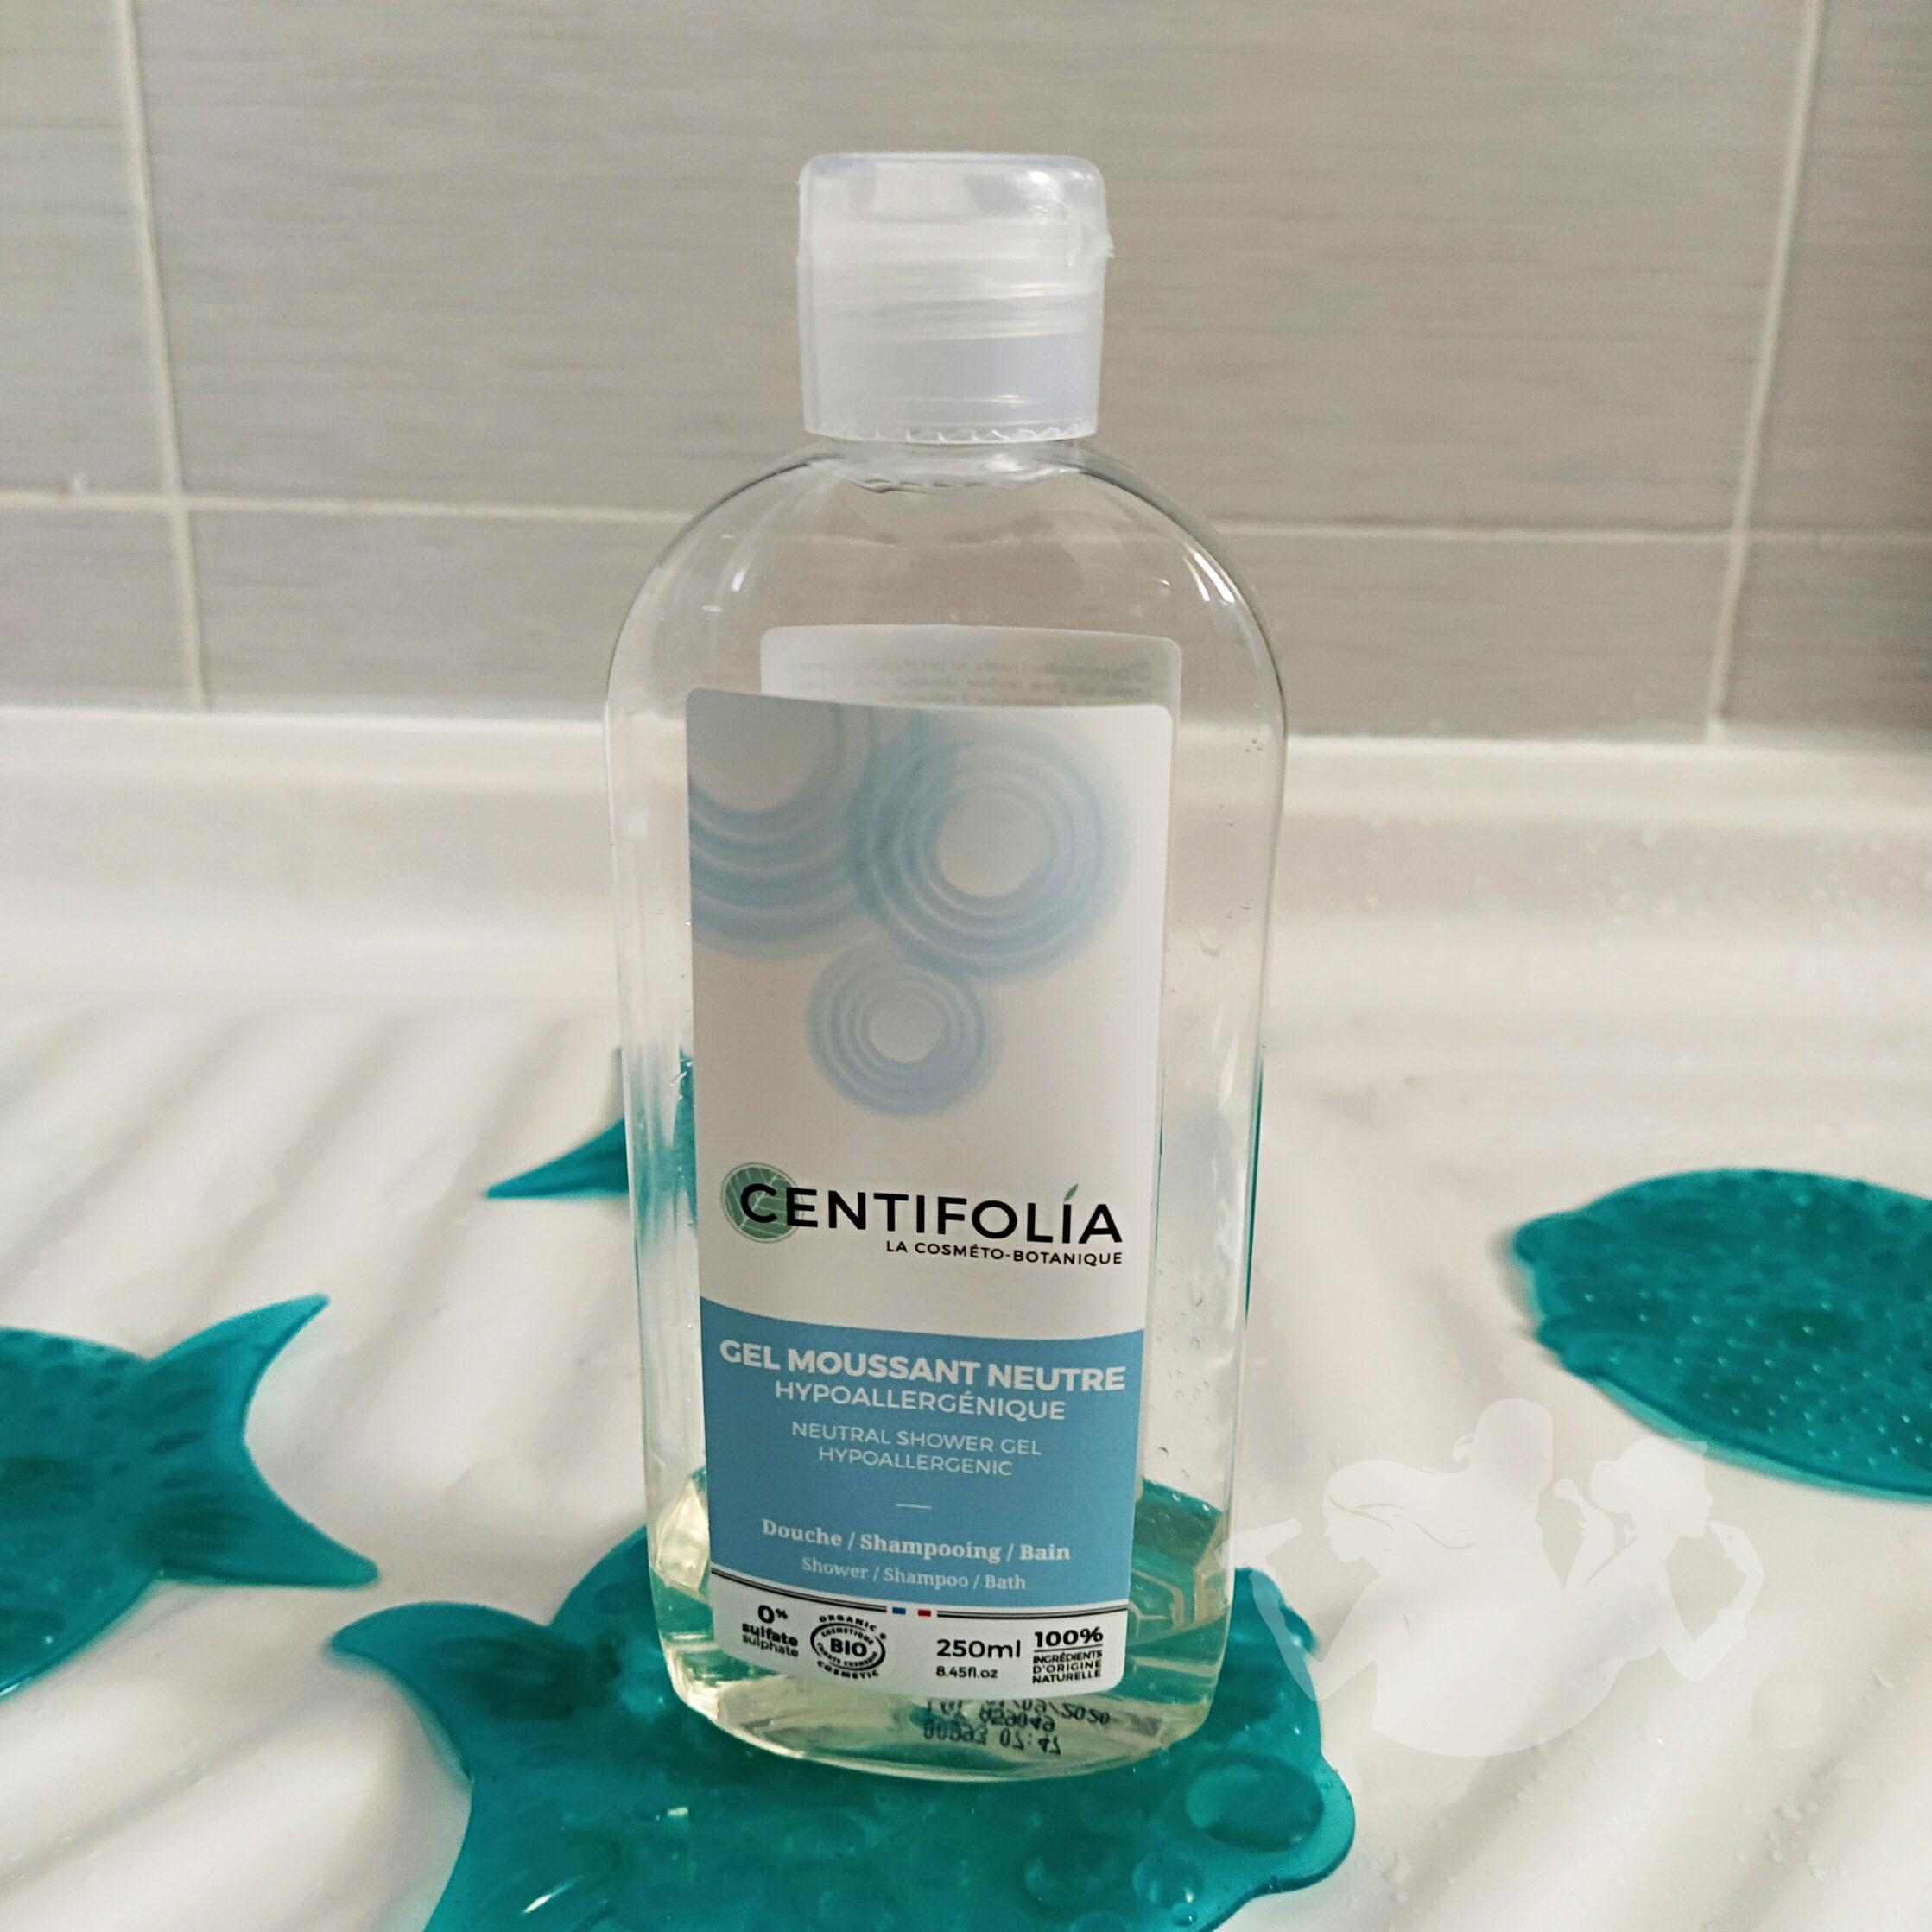 Gel detergente neutro – Centifolia